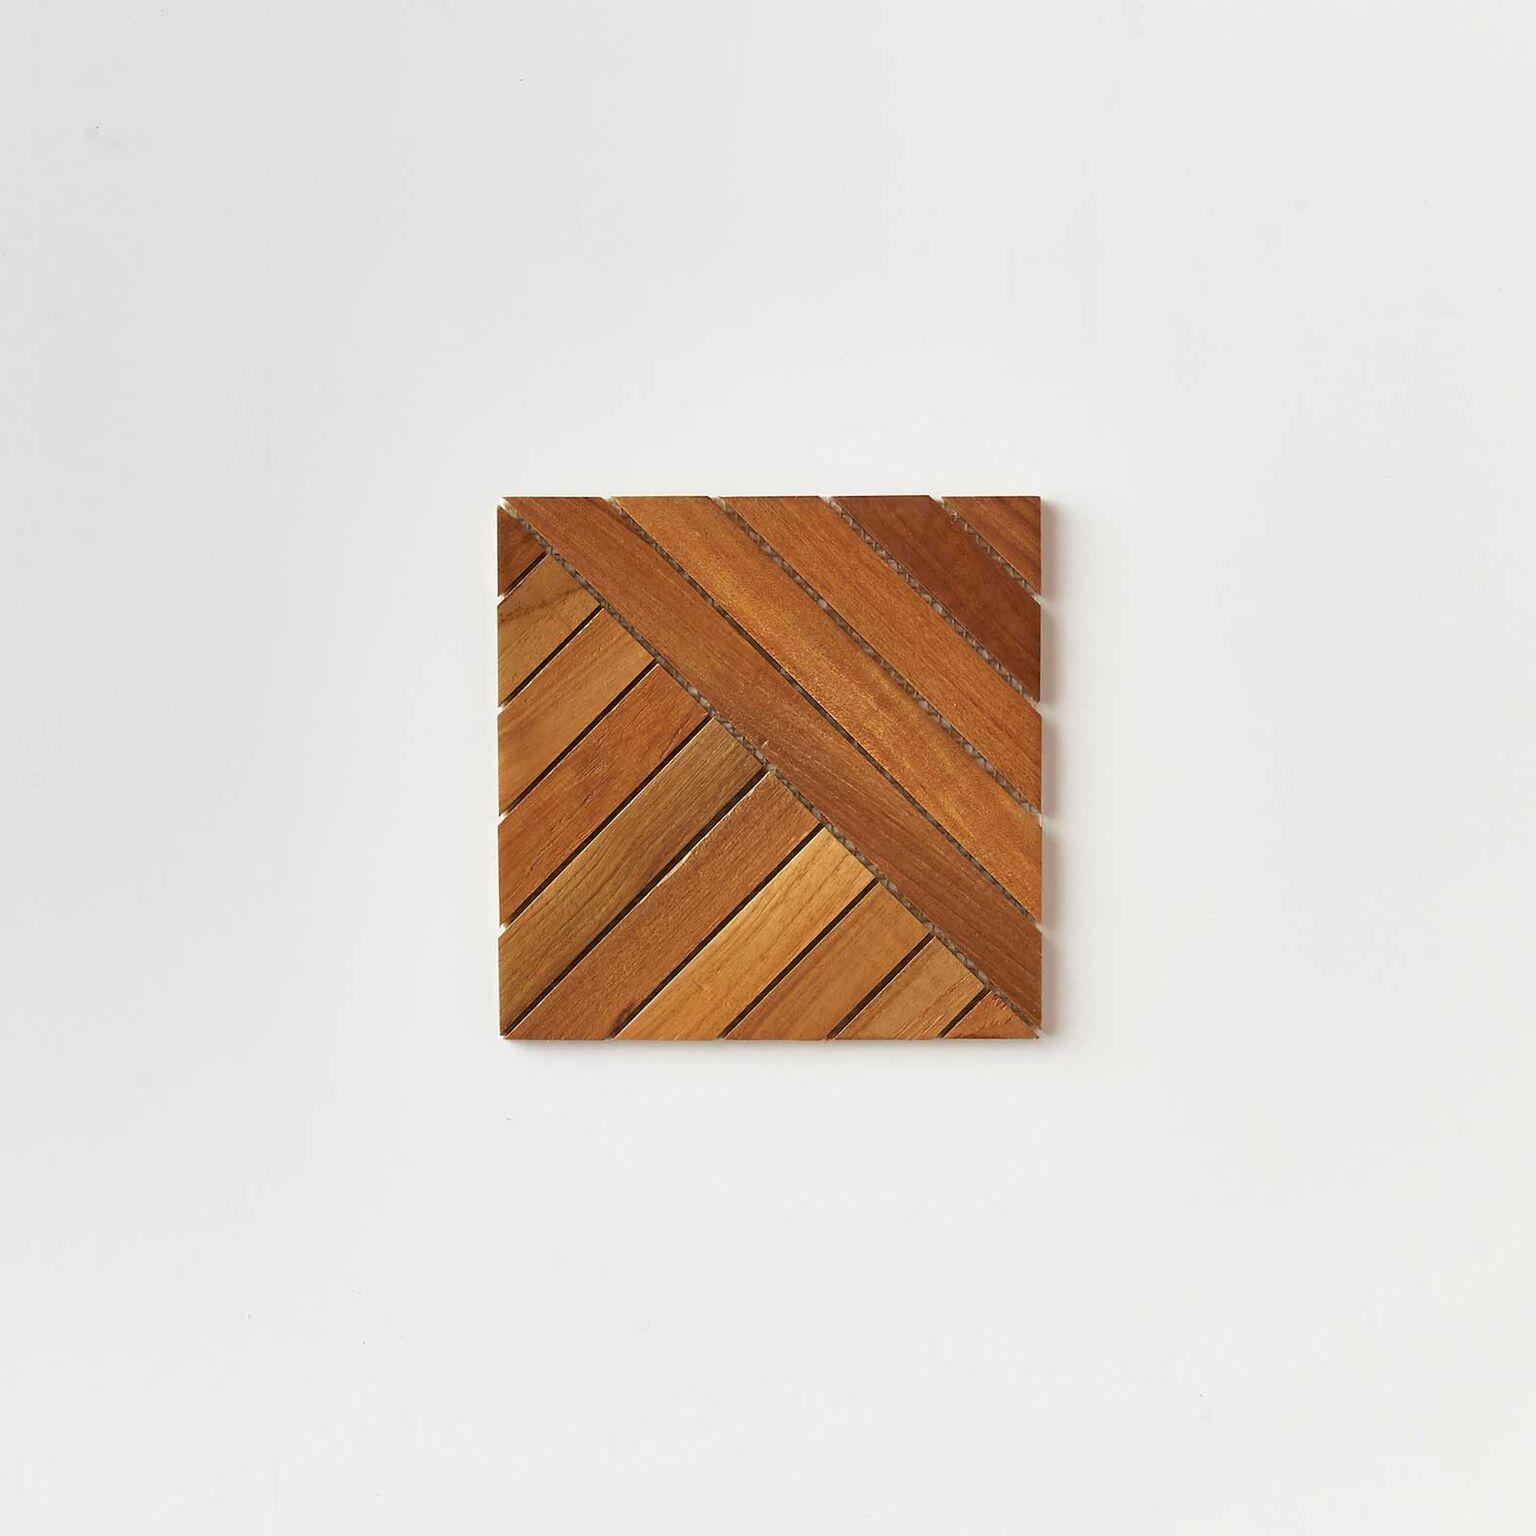 natural single tile 4 - Teak Tile - Align